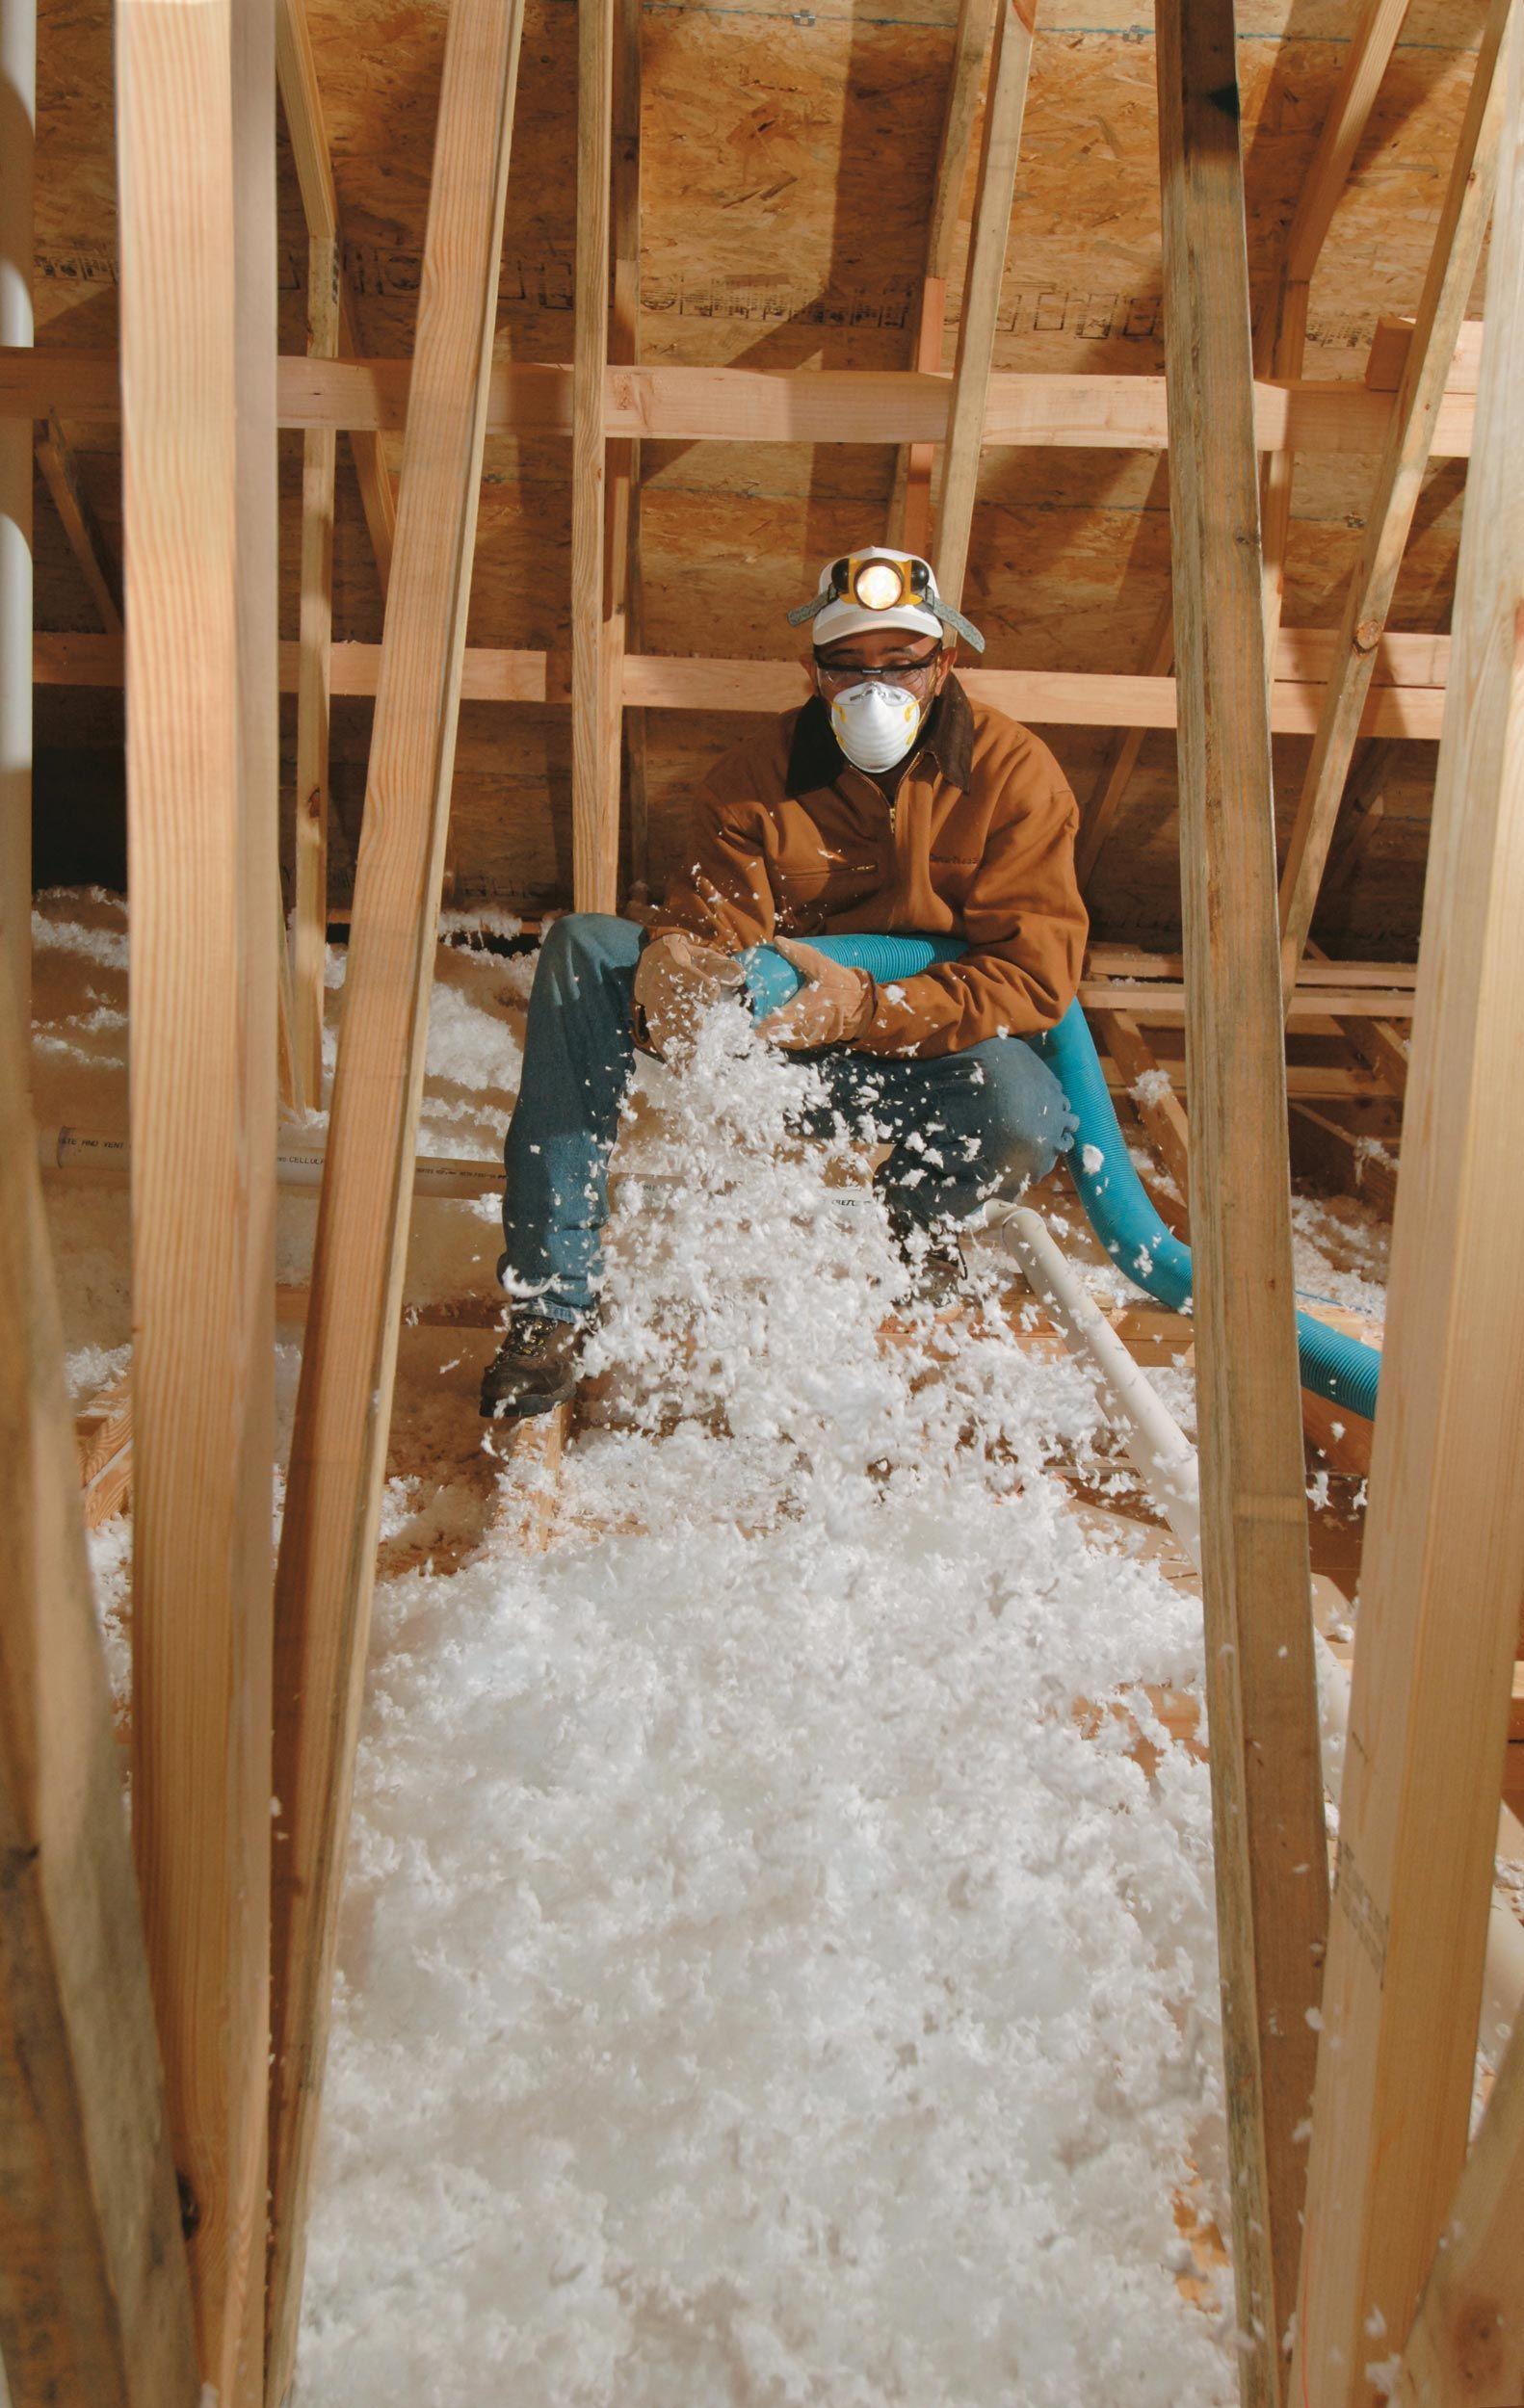 Attic Restoration For Dallas Texas Homes And Properties Attic Remodel Attic Flooring Attic Design